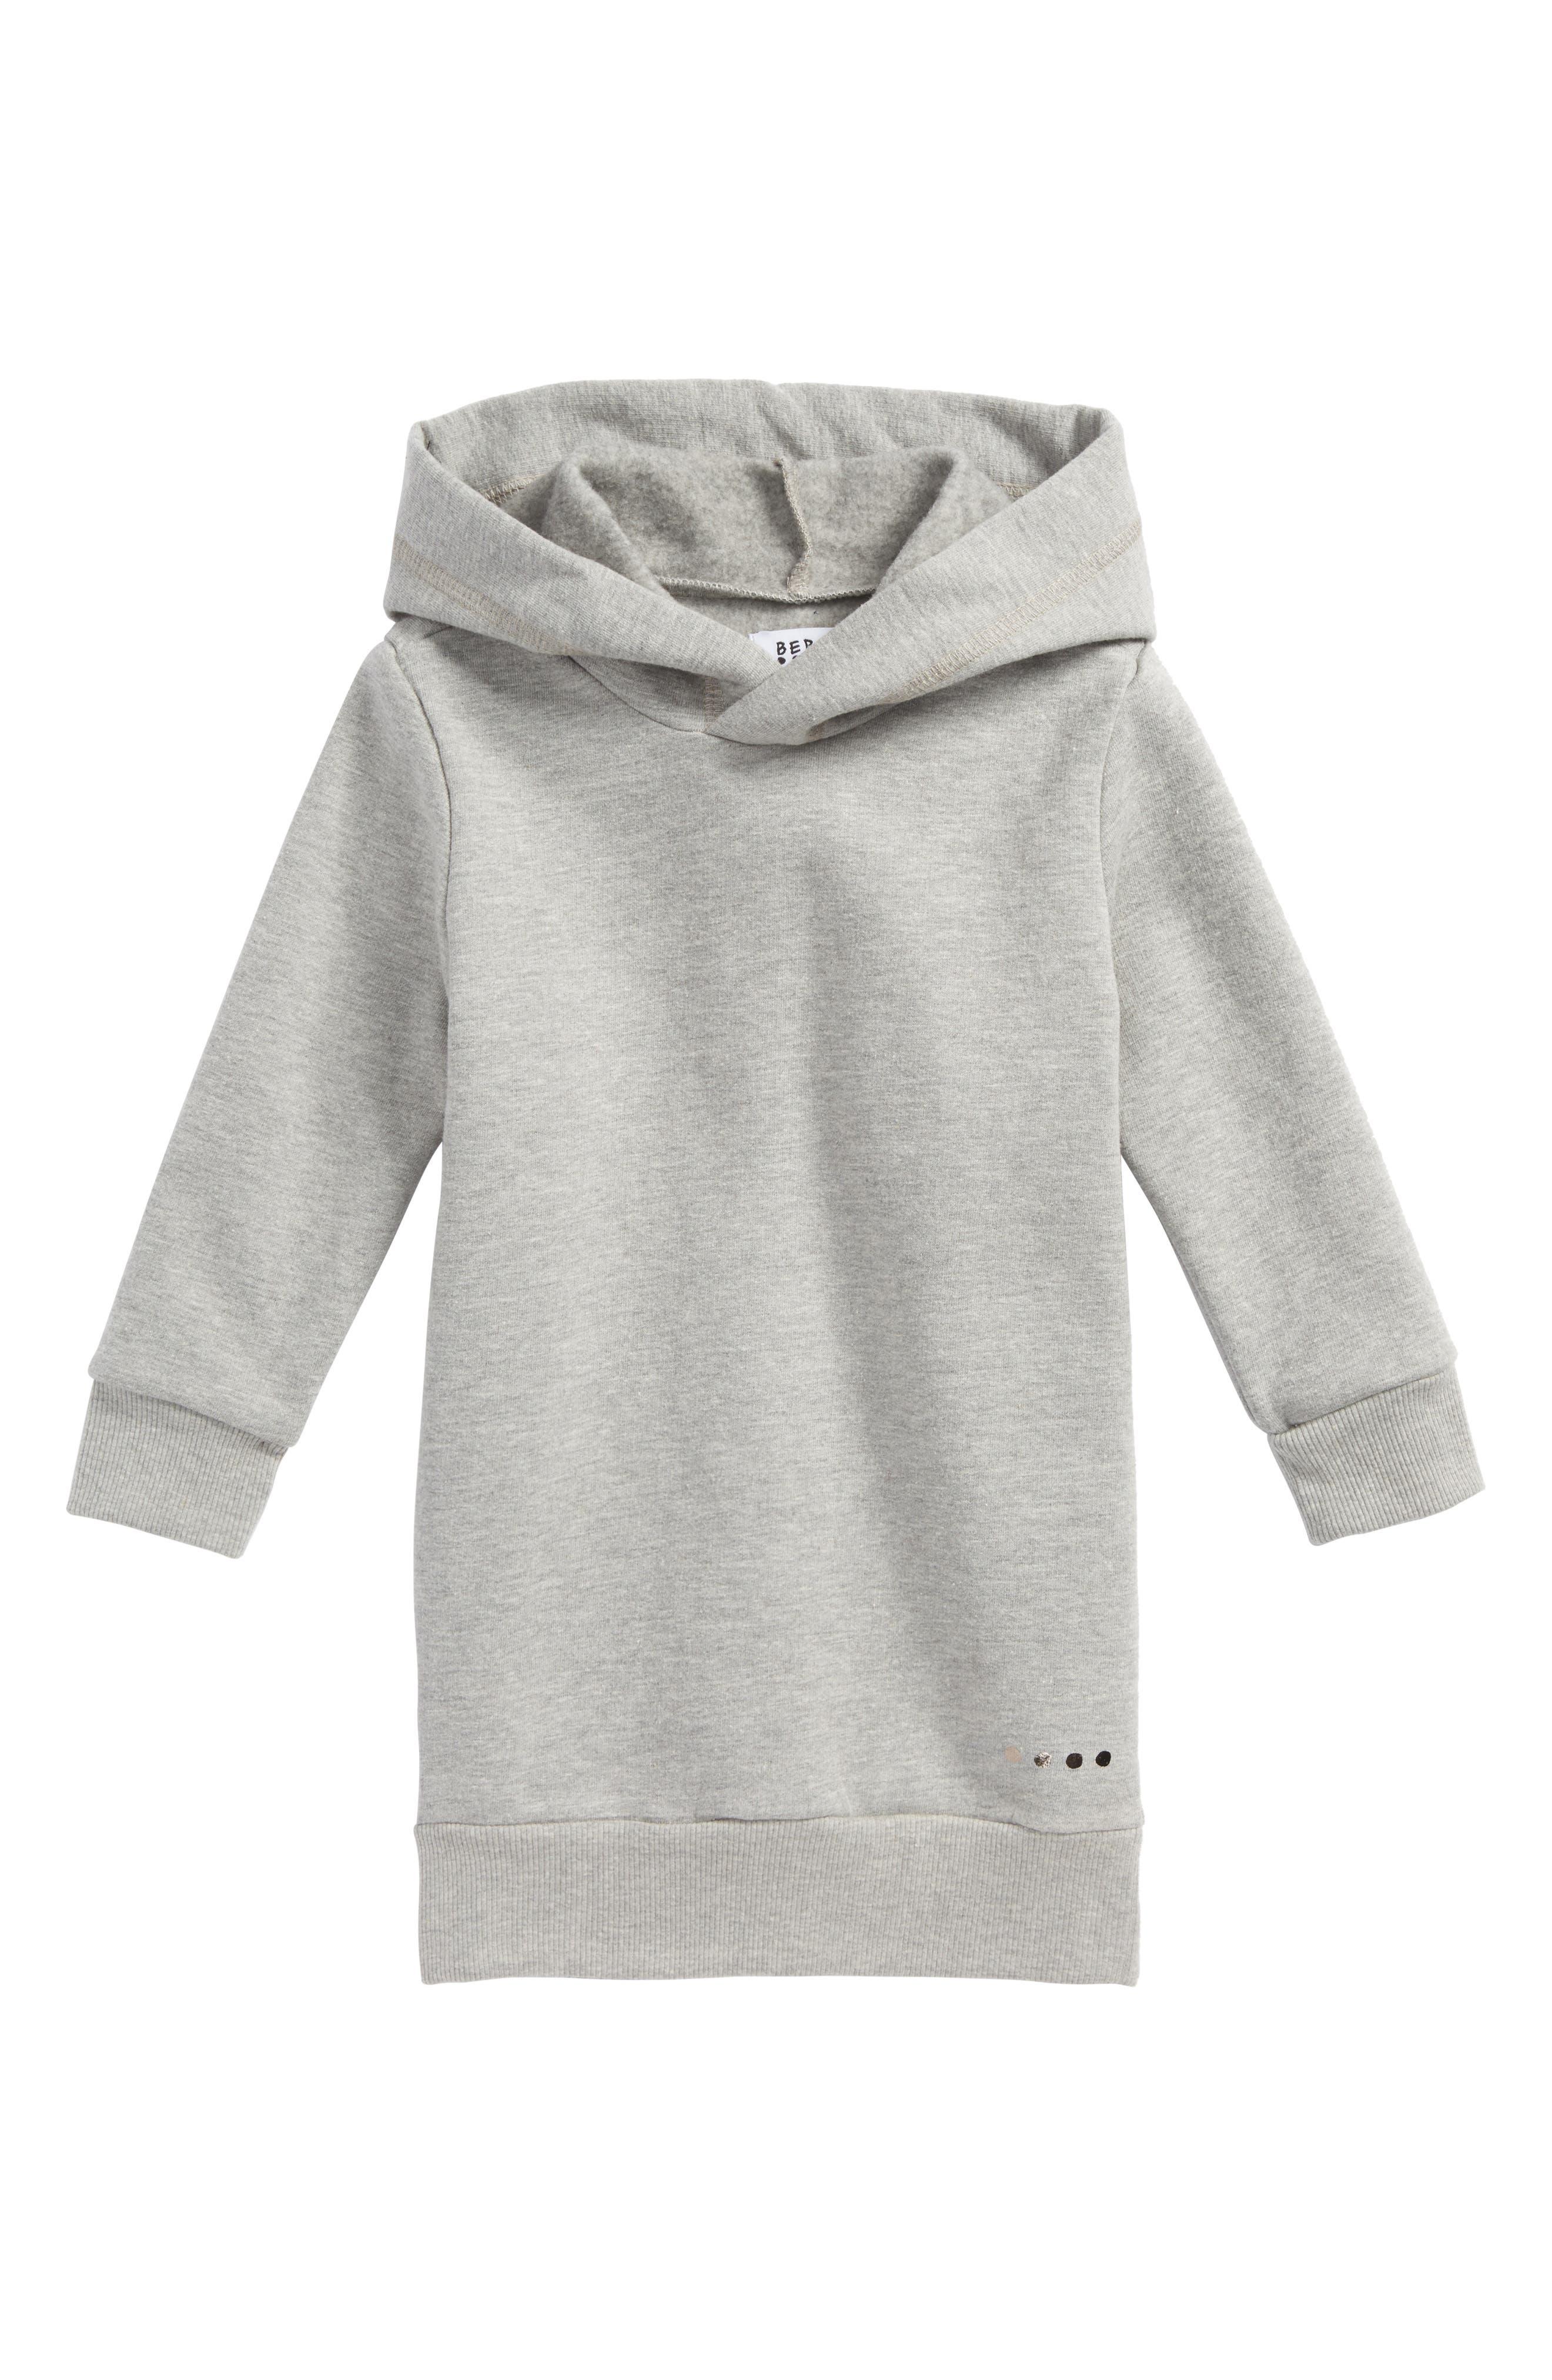 Luna Hooded Sweatshirt Dress,                         Main,                         color, Heather Grey